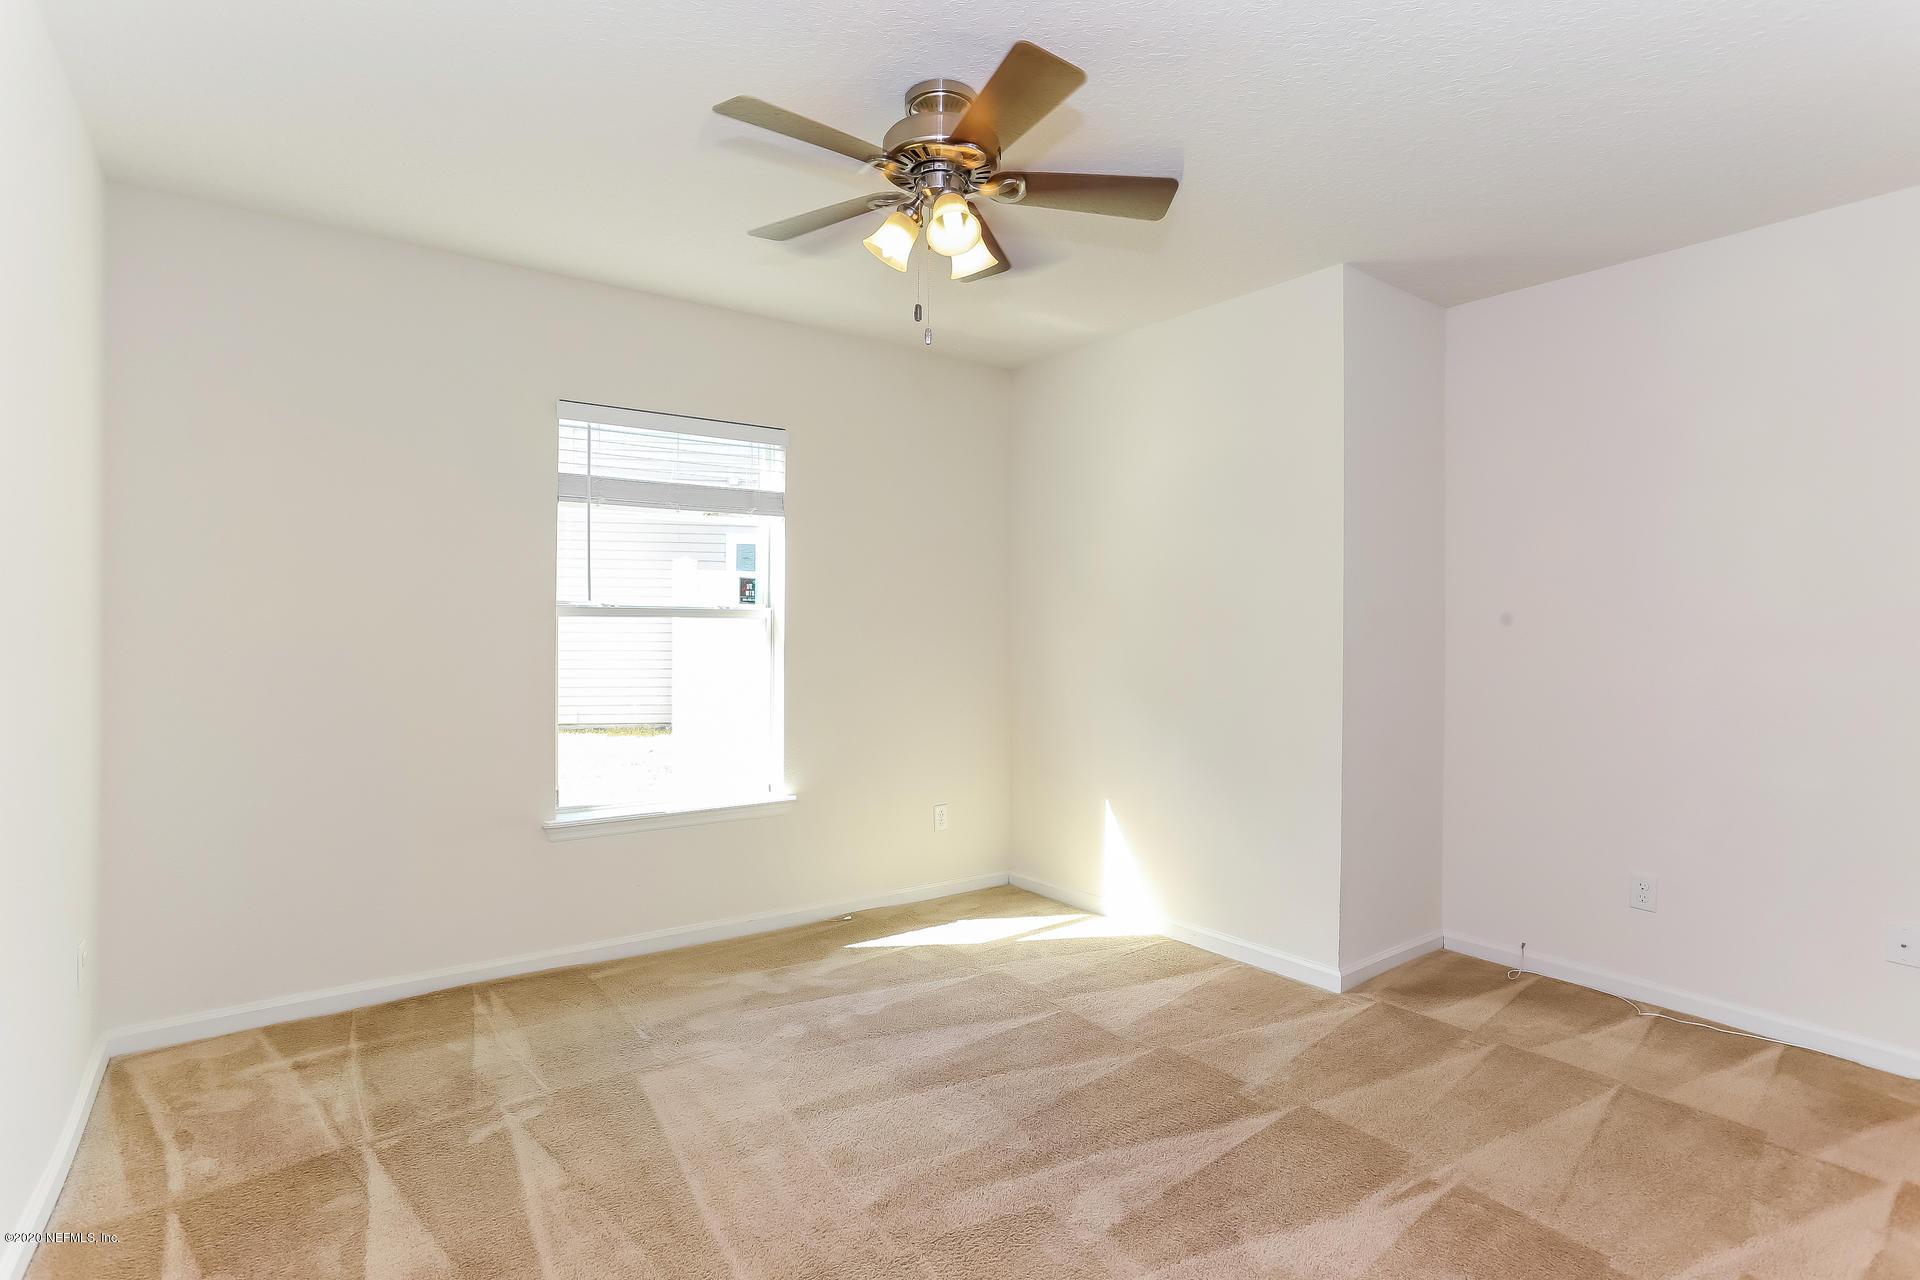 12050 ALEXANDRA, JACKSONVILLE, FLORIDA 32218, 3 Bedrooms Bedrooms, ,2 BathroomsBathrooms,Rental,For Rent,ALEXANDRA,1081716